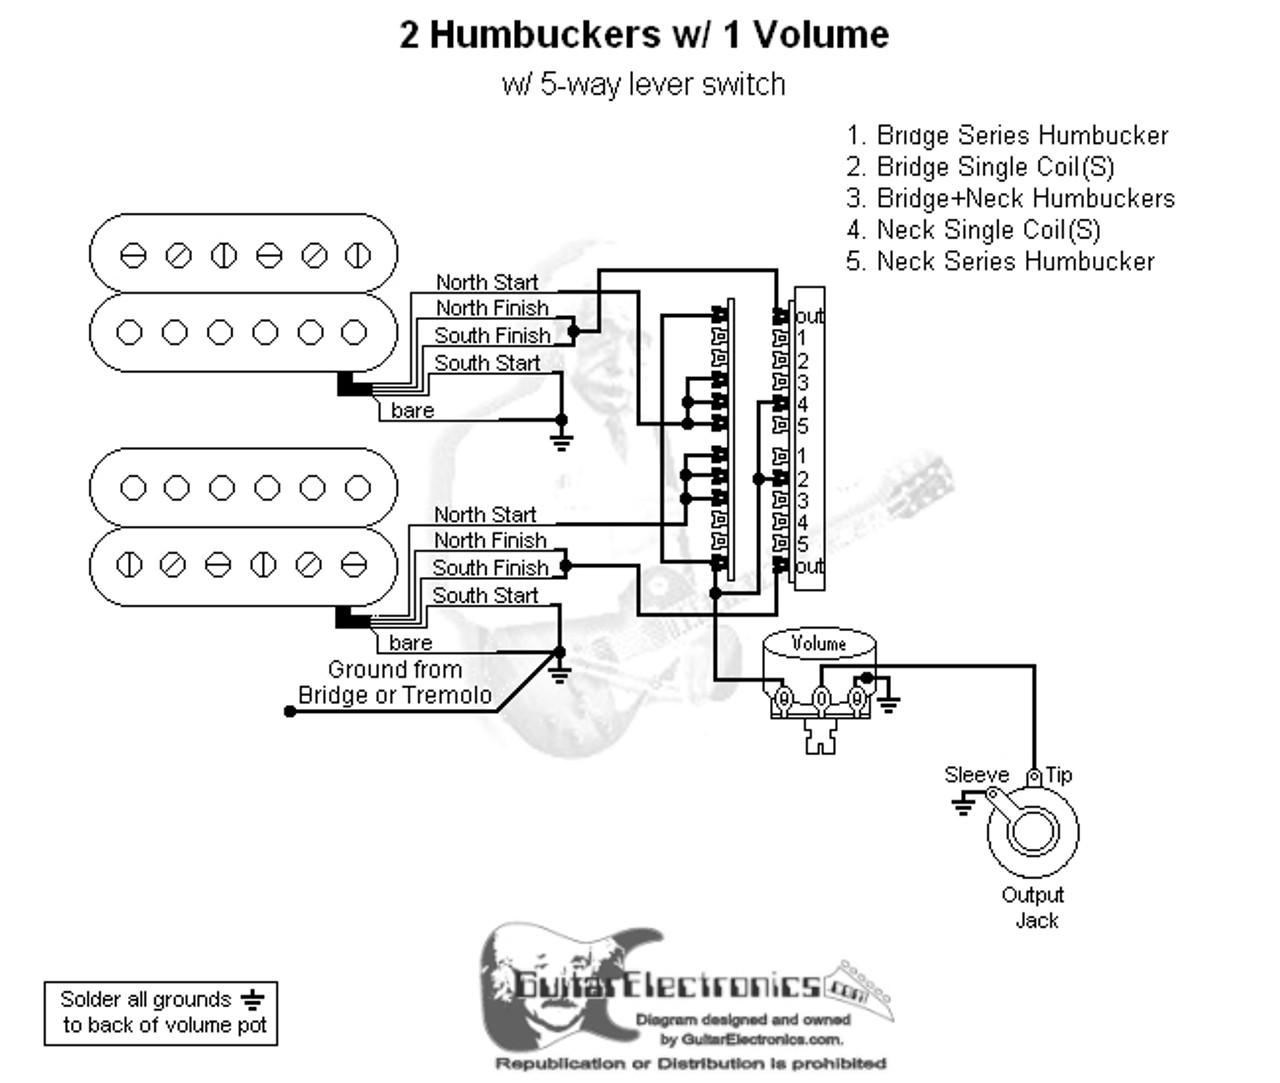 2 Humbuckers/5-Way Lever Switch/1 Volume/02